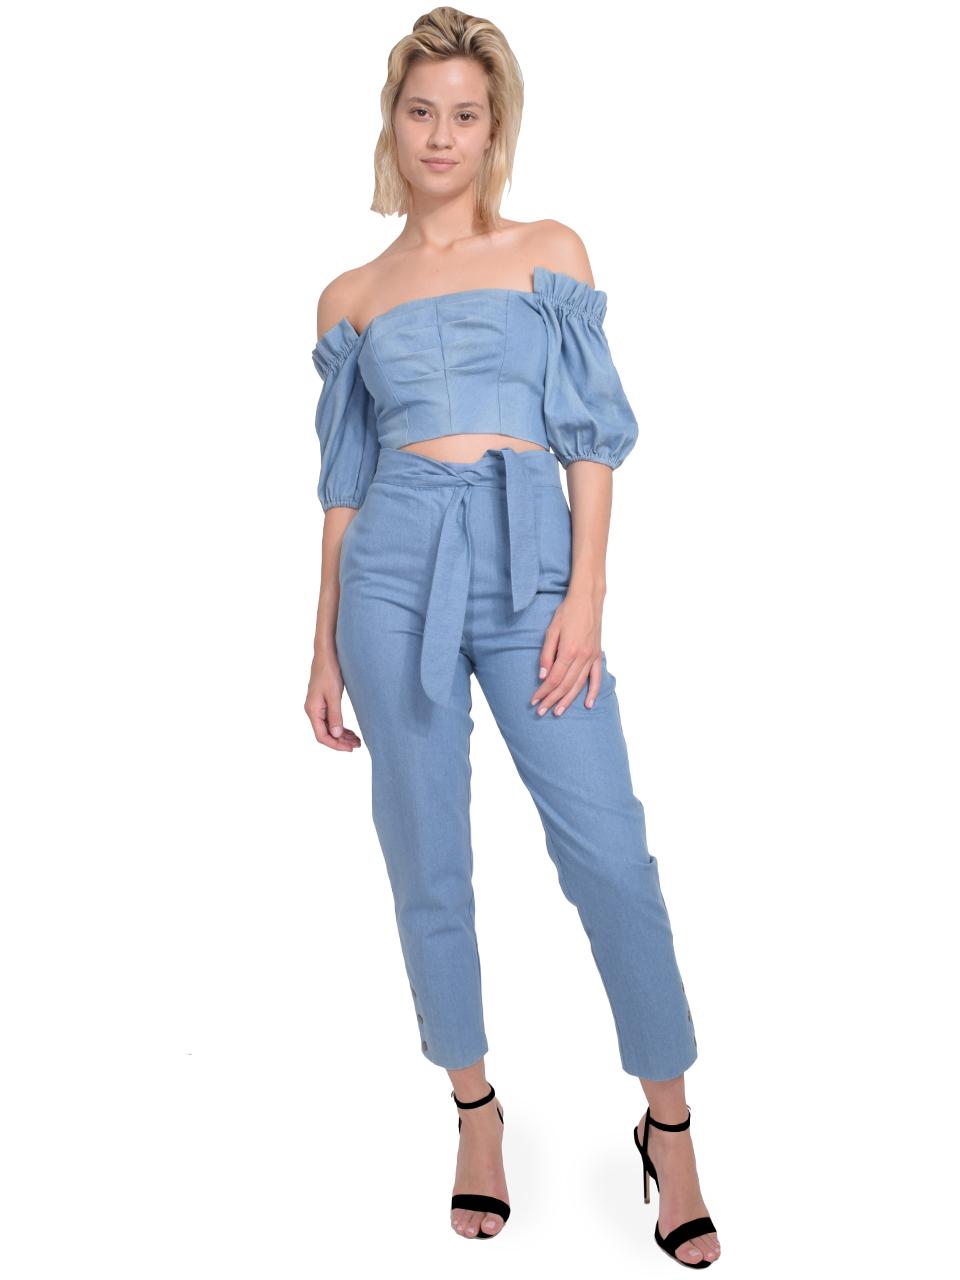 Karina Grimaldi Stella Denim Pants Full Outfit